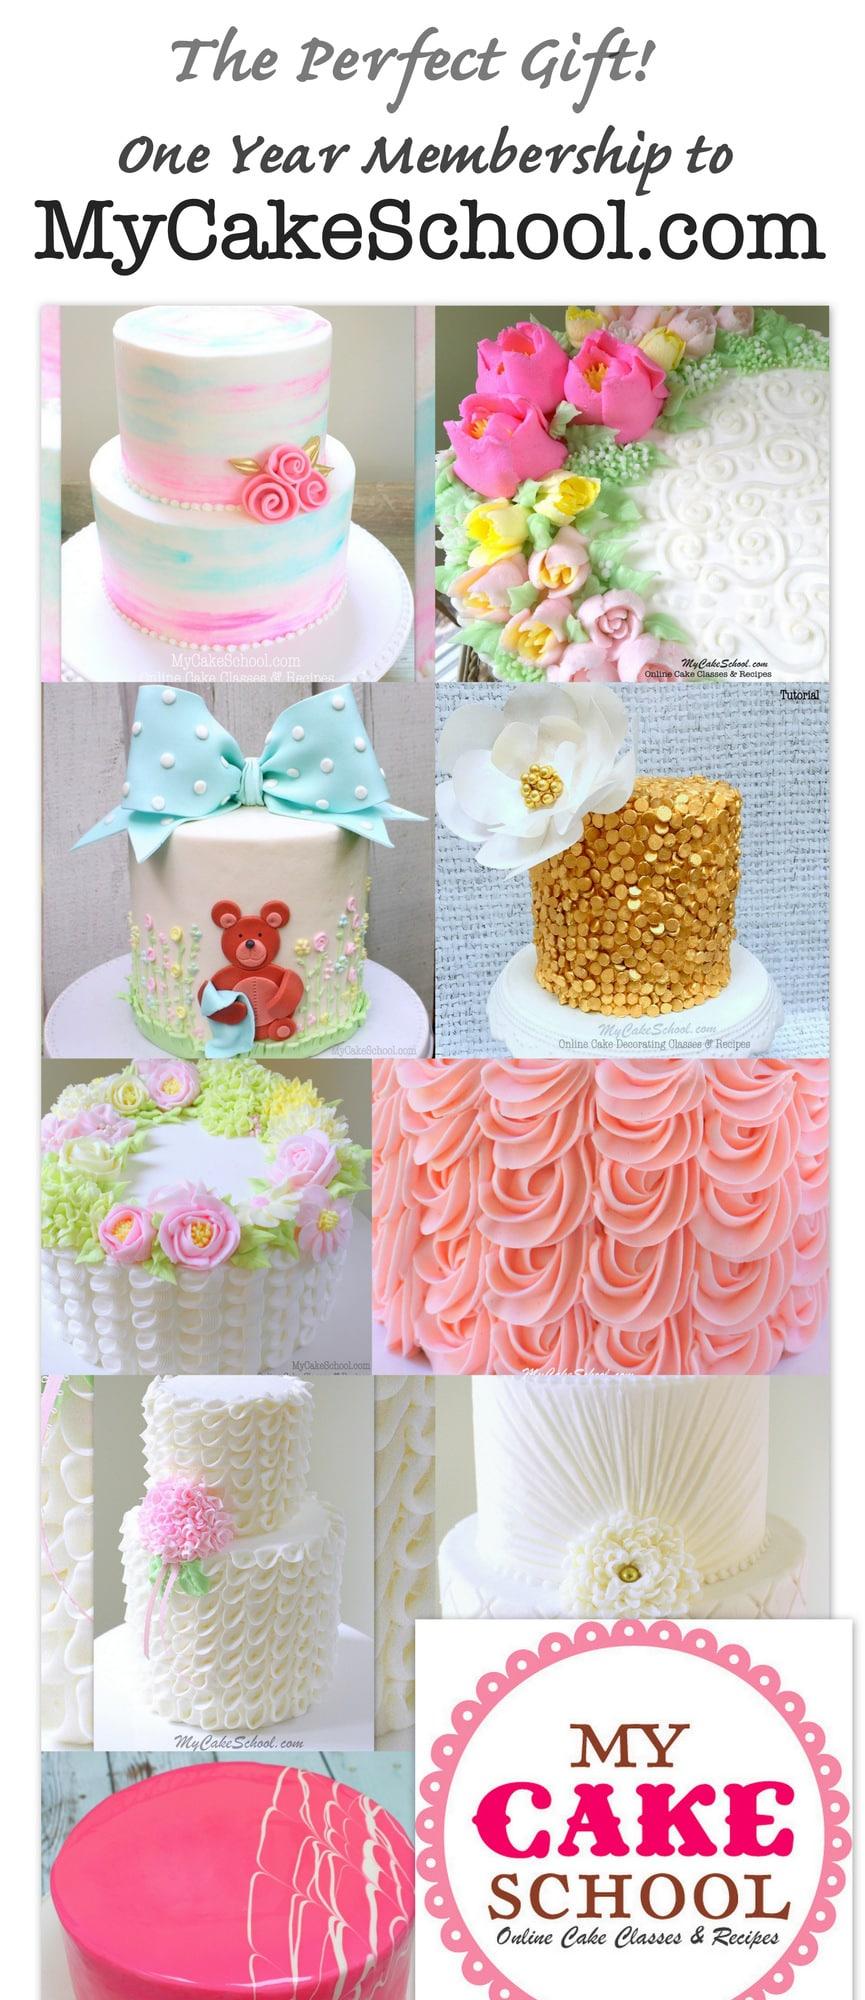 Cake Decorating Gifts : My Cake School Gift Membership My Cake School